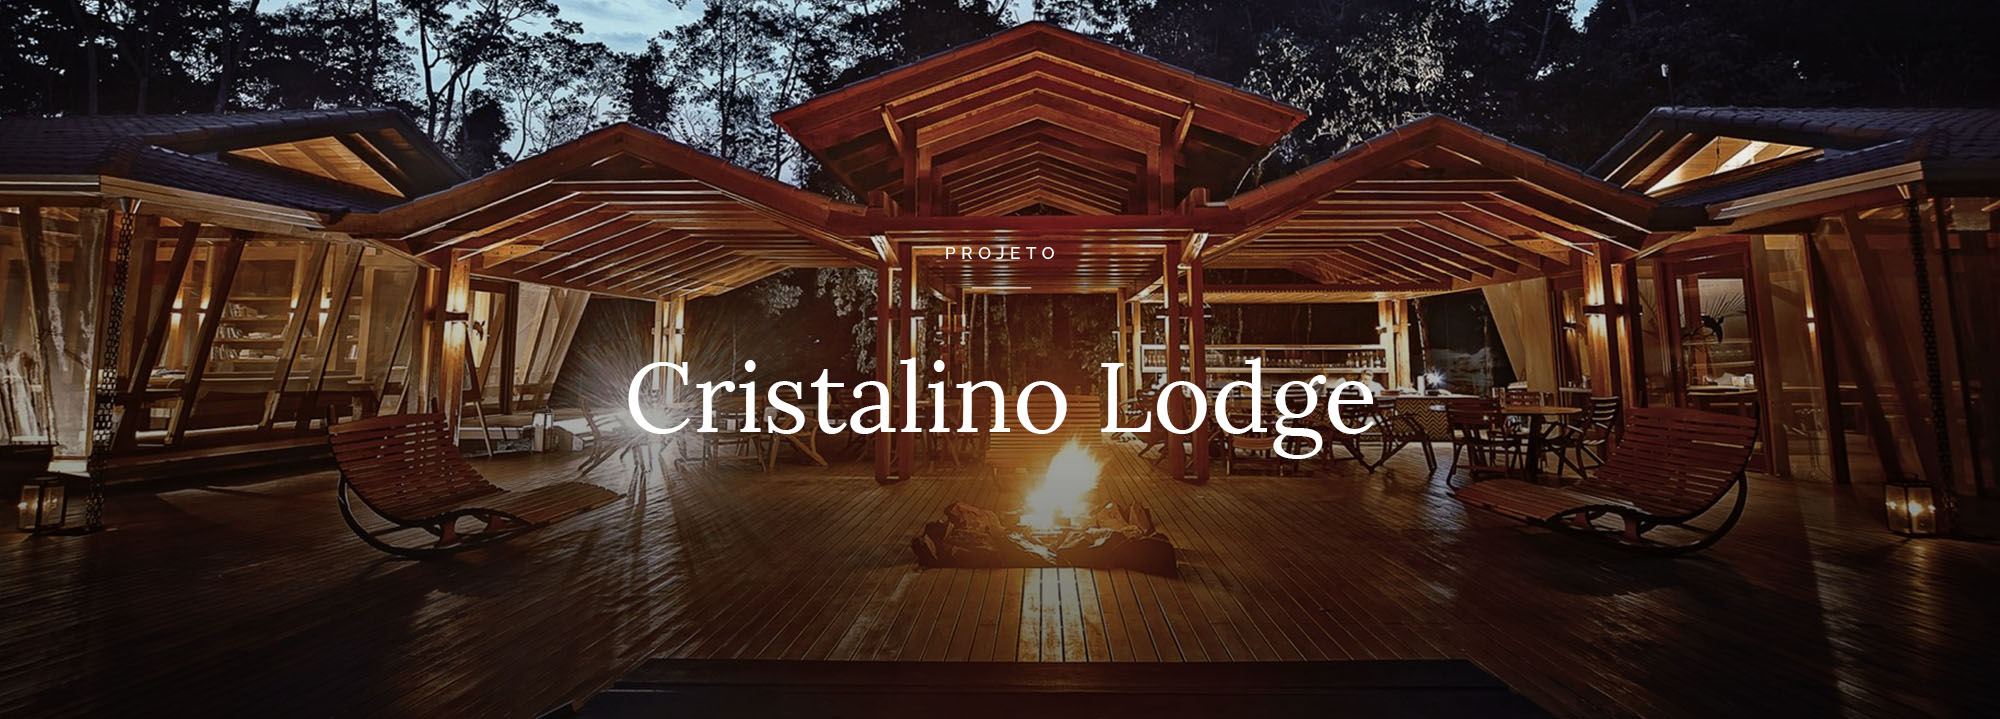 CristalinoLodge